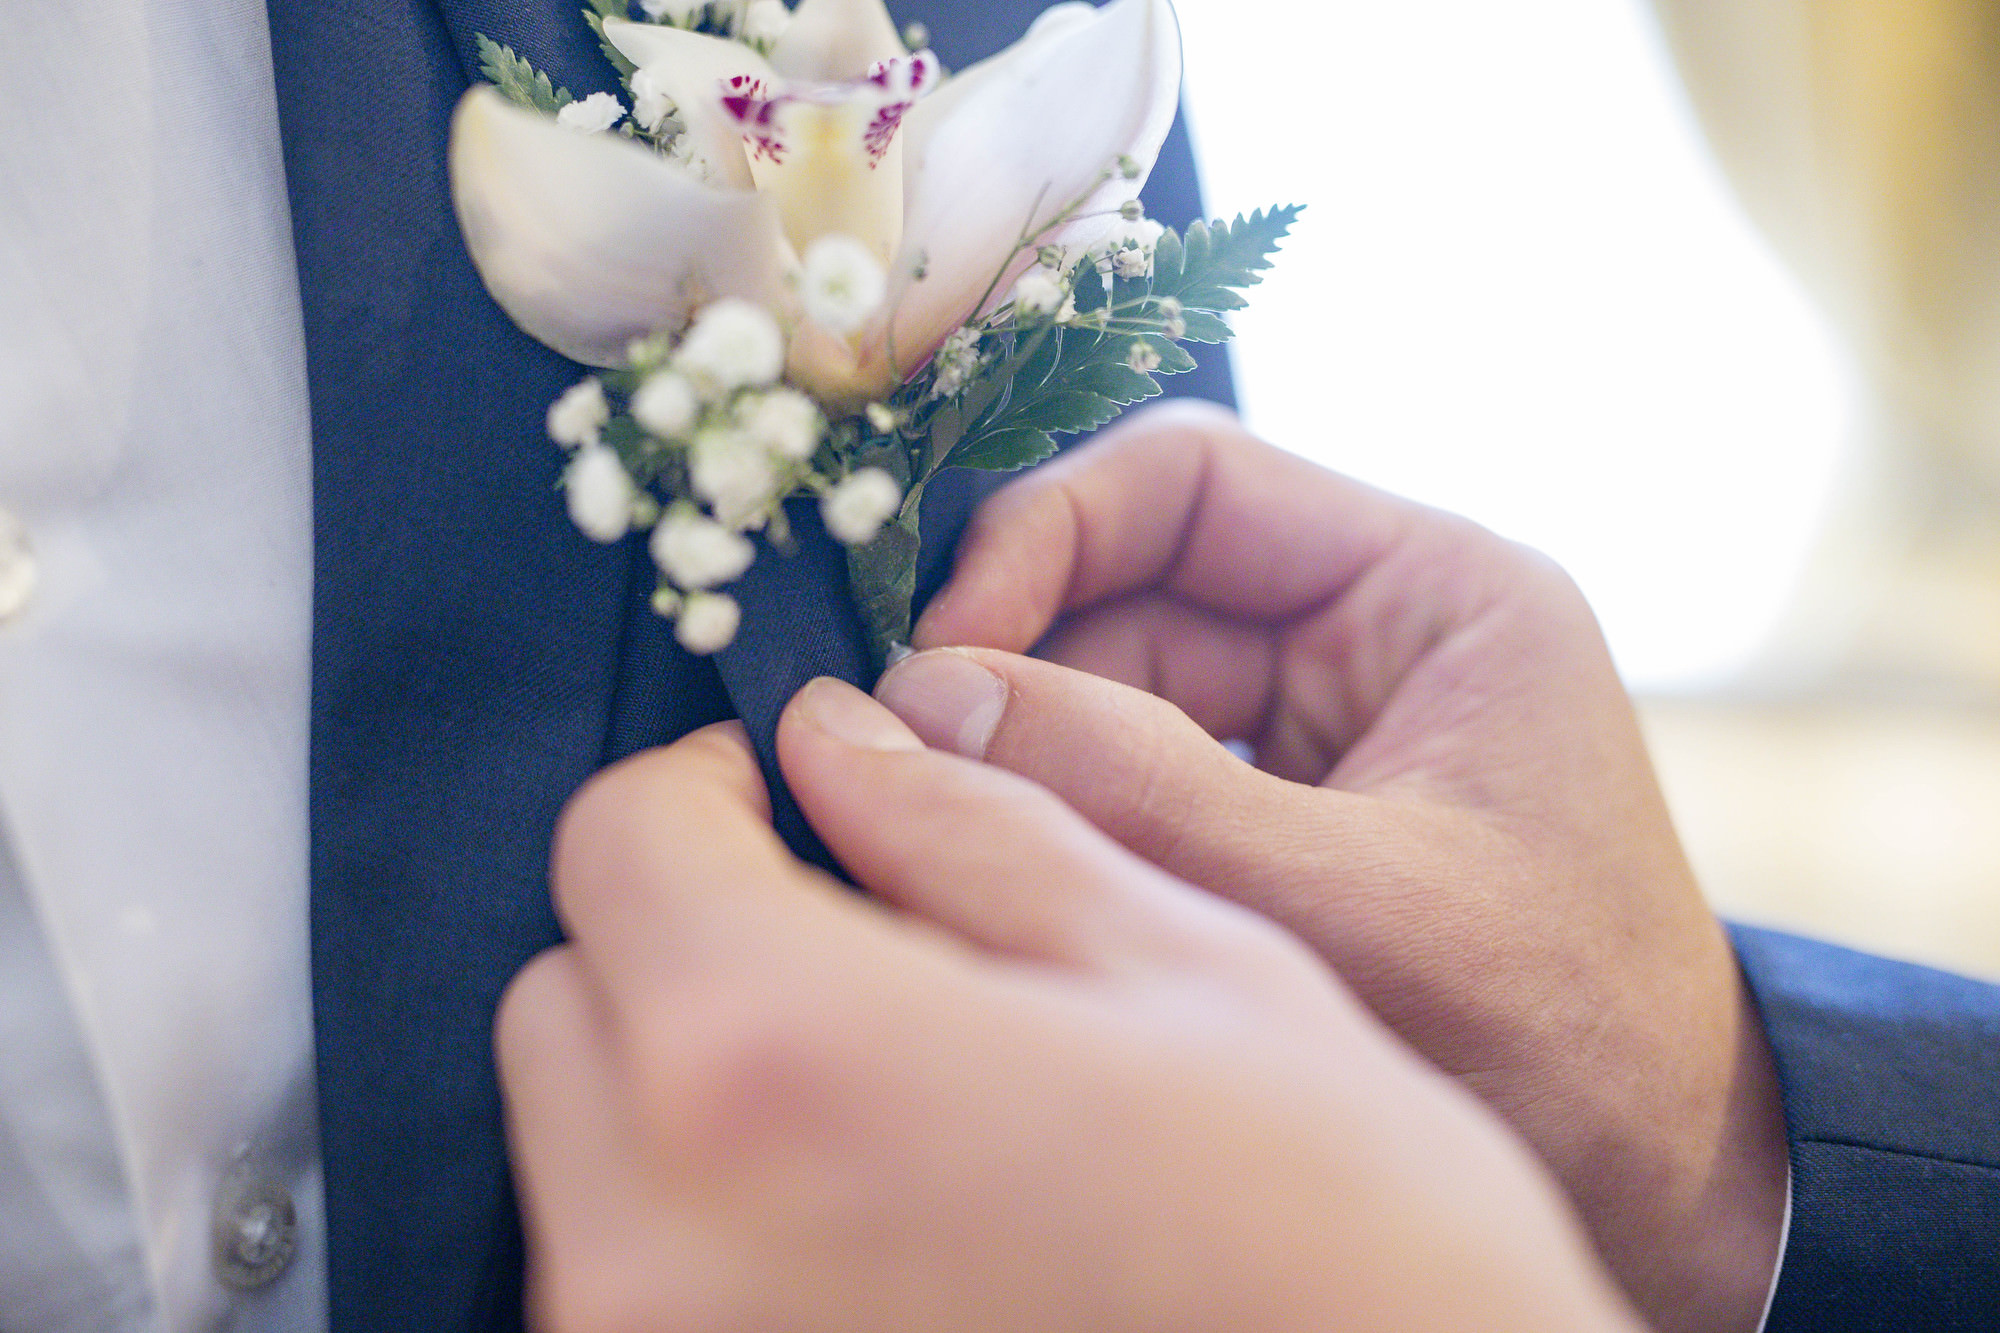 muckross_park_hotel_grougane_barra_wedding_photographer_goldenmoments_011.jpg